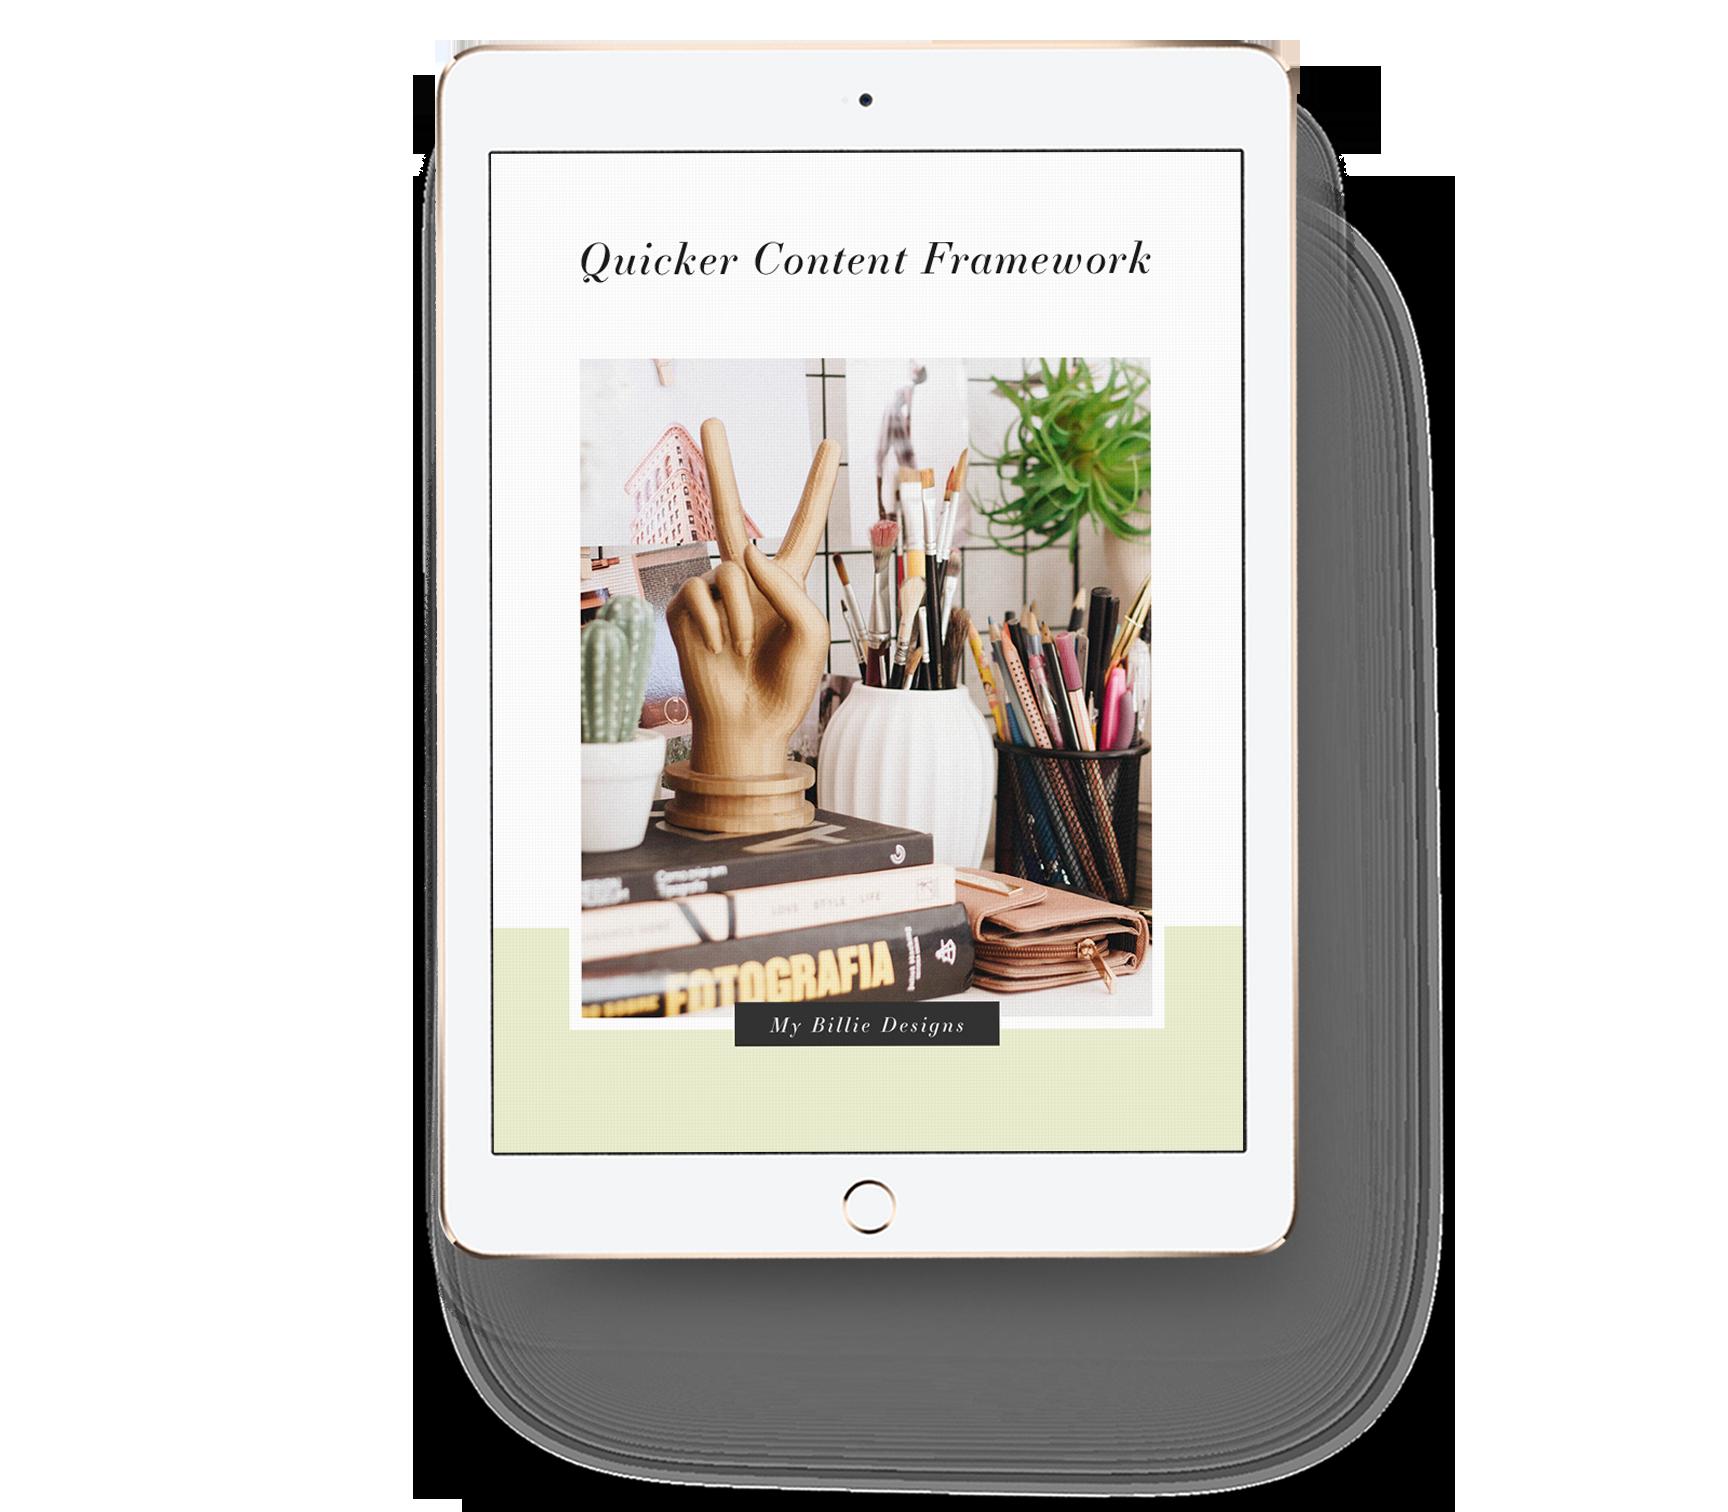 Quicker-Content-Framework-mockup-on-iPad